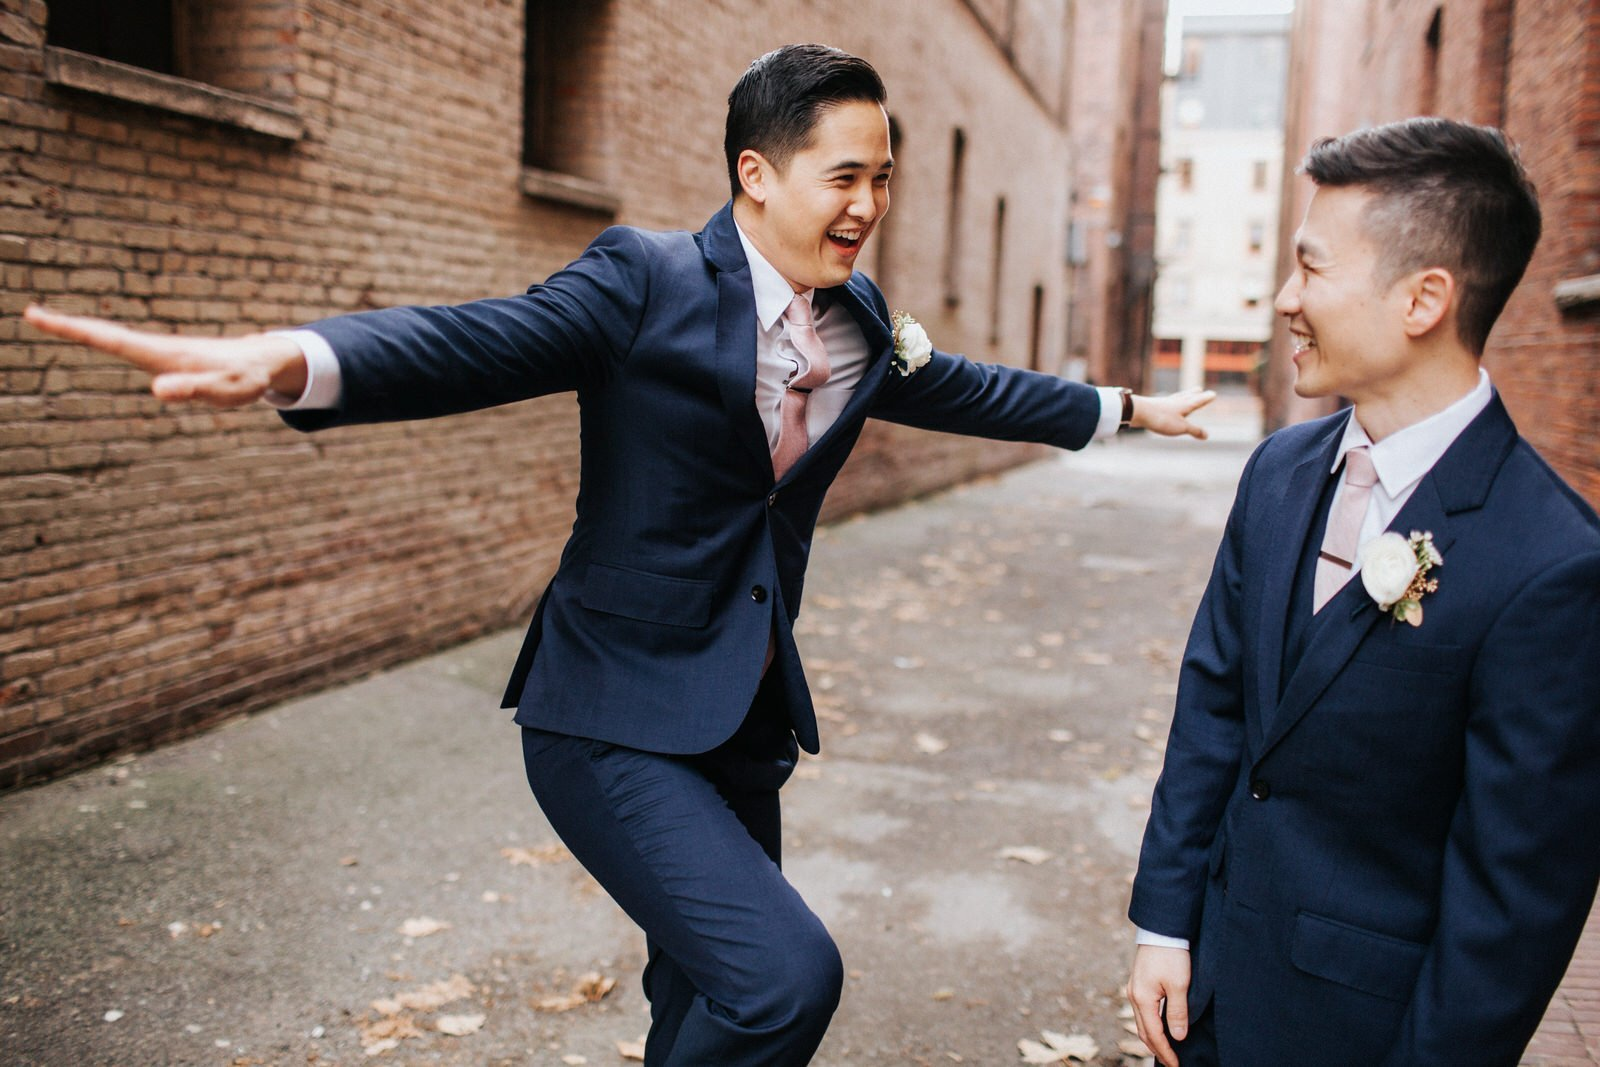 The groomsmen laugh and joke during photos